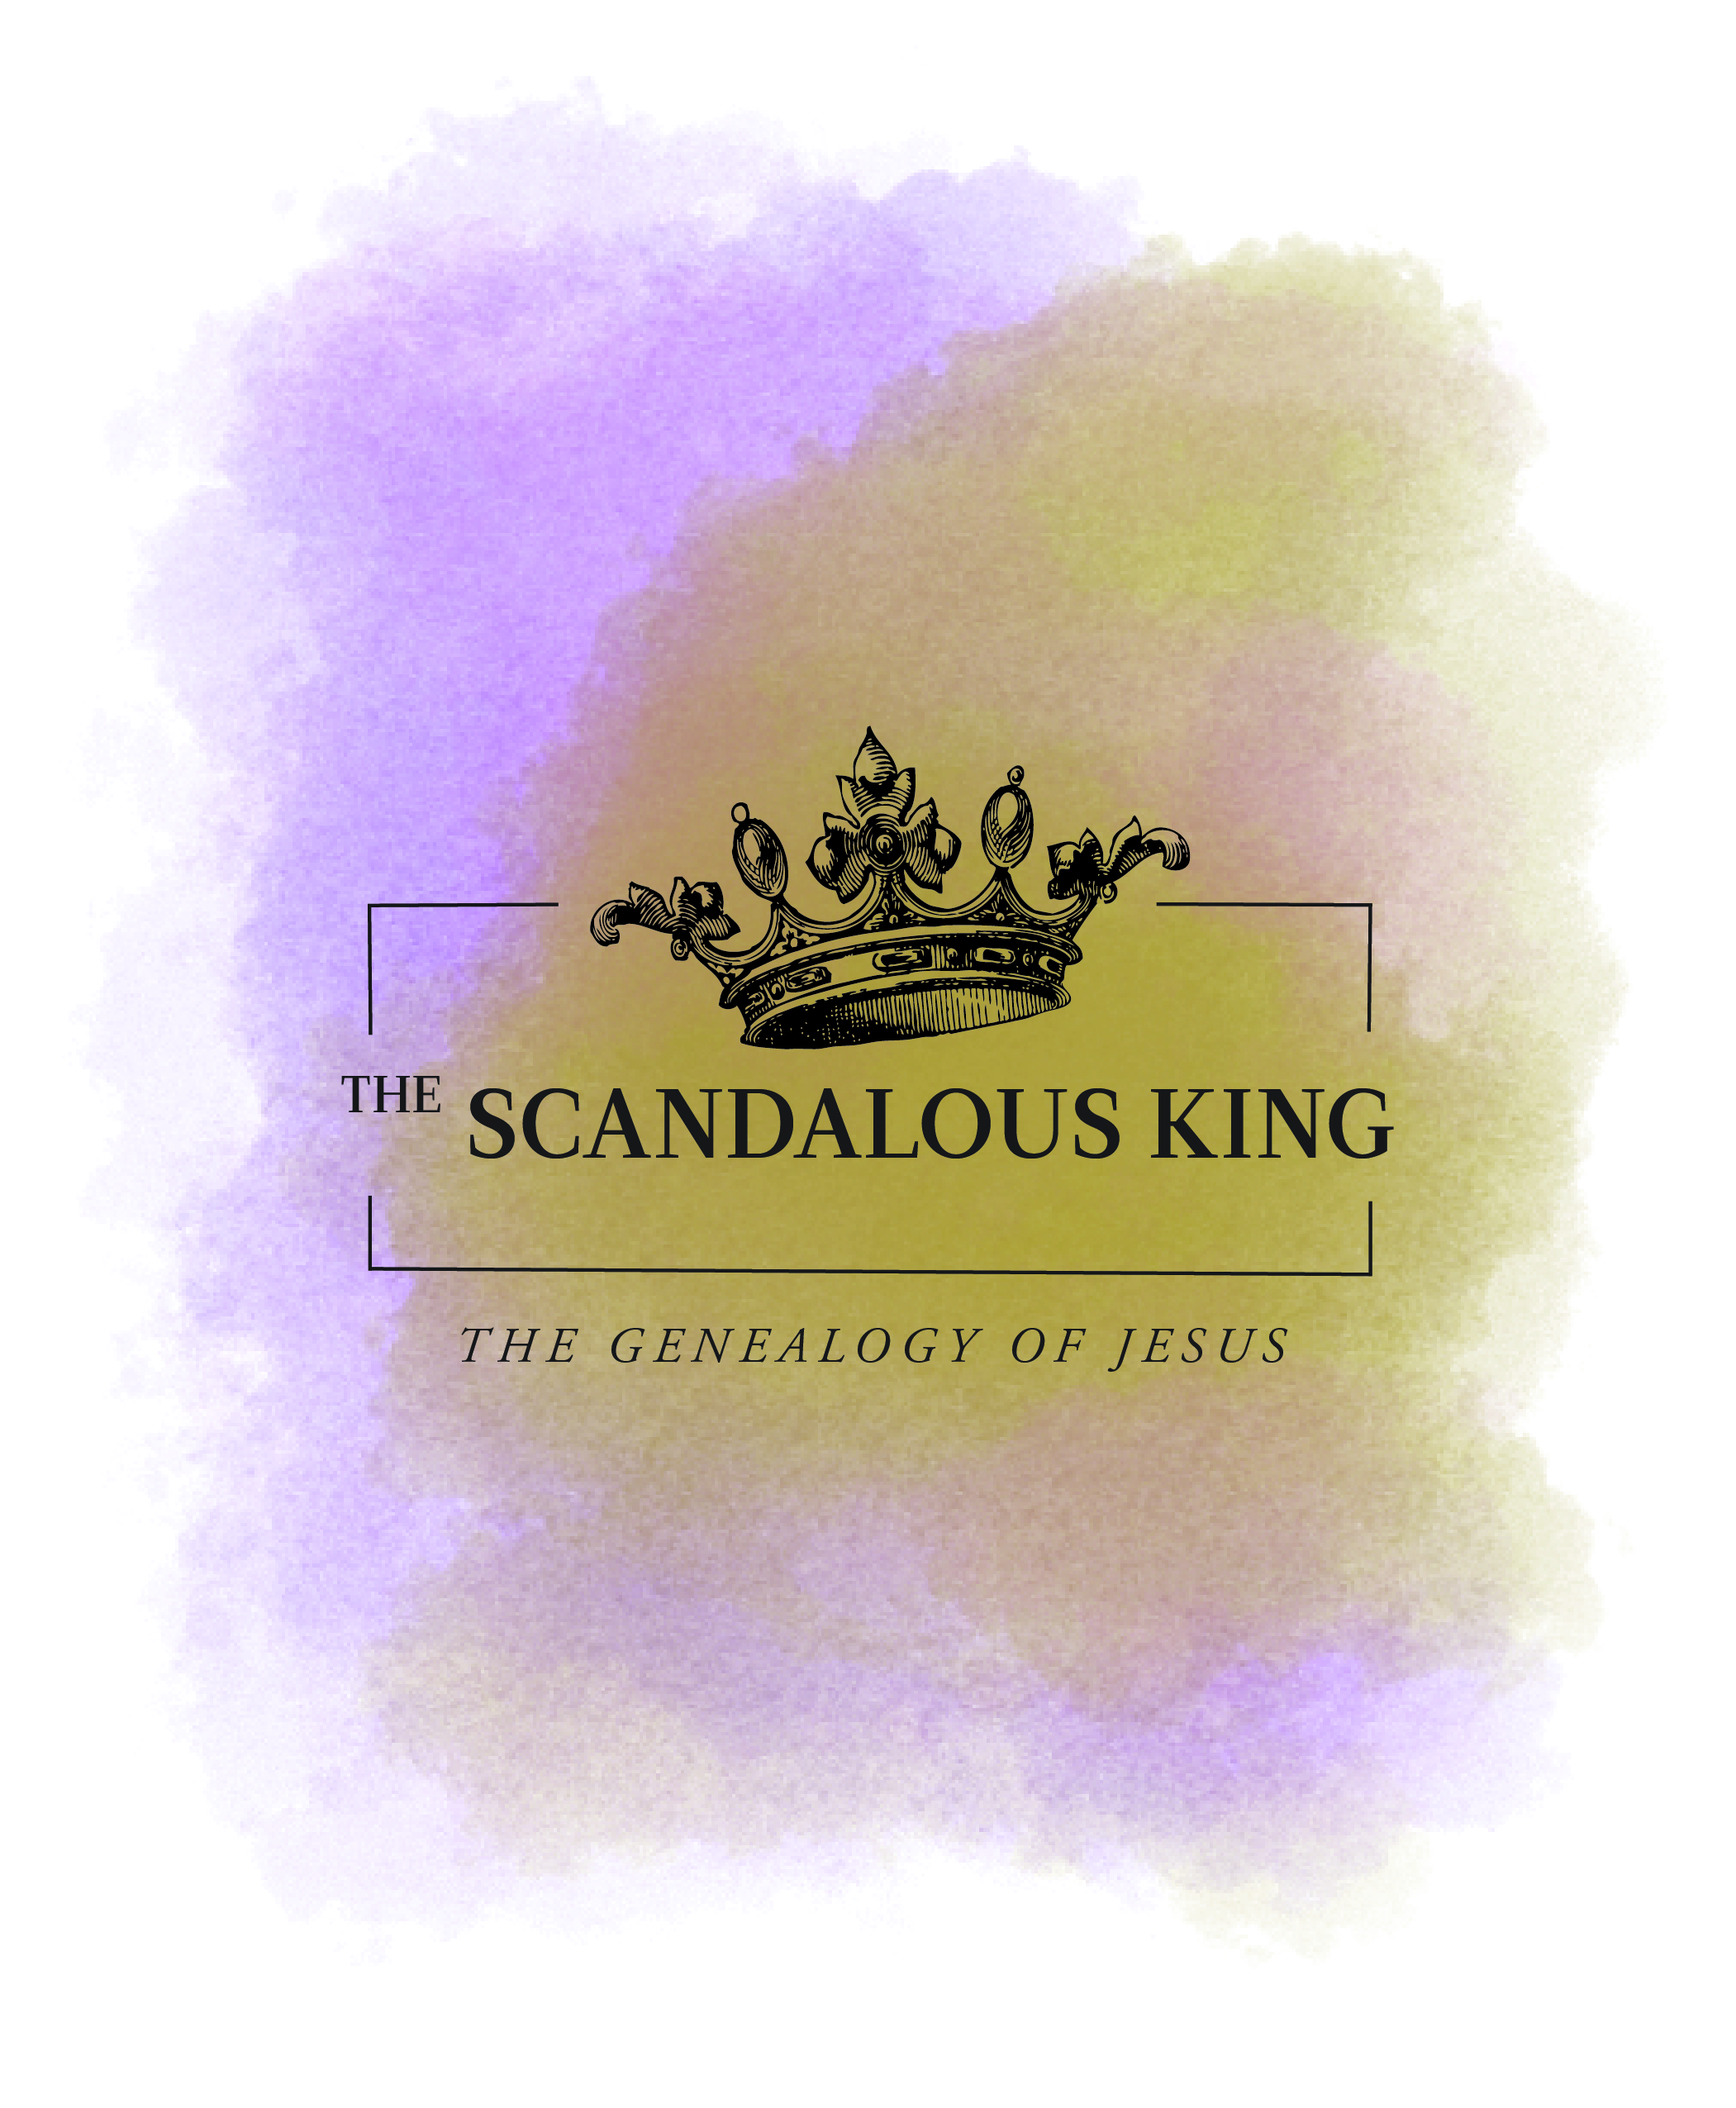 FinalScandalousKingGuide-05.jpg